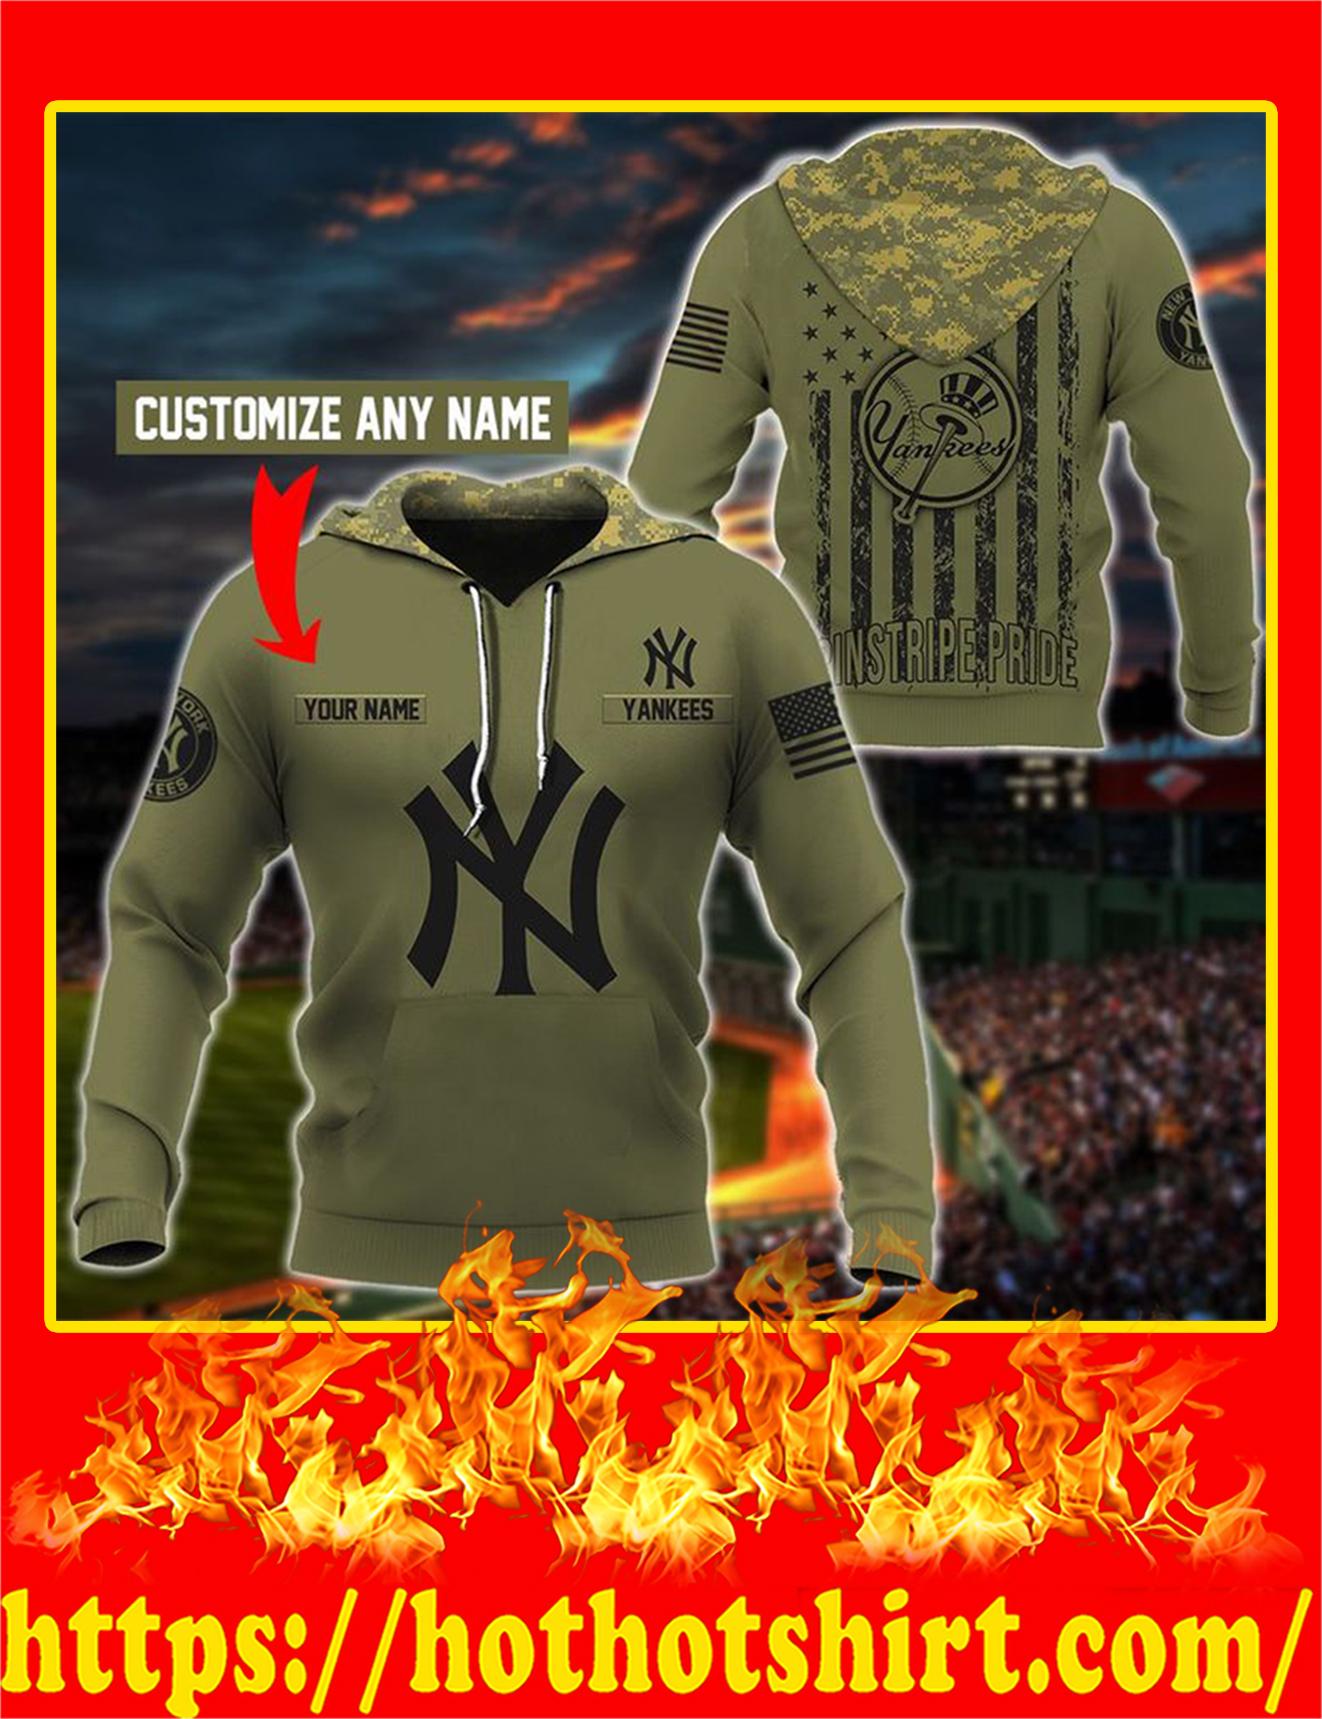 Yankees Customize Custom Name 3D Hoodie - 2XL